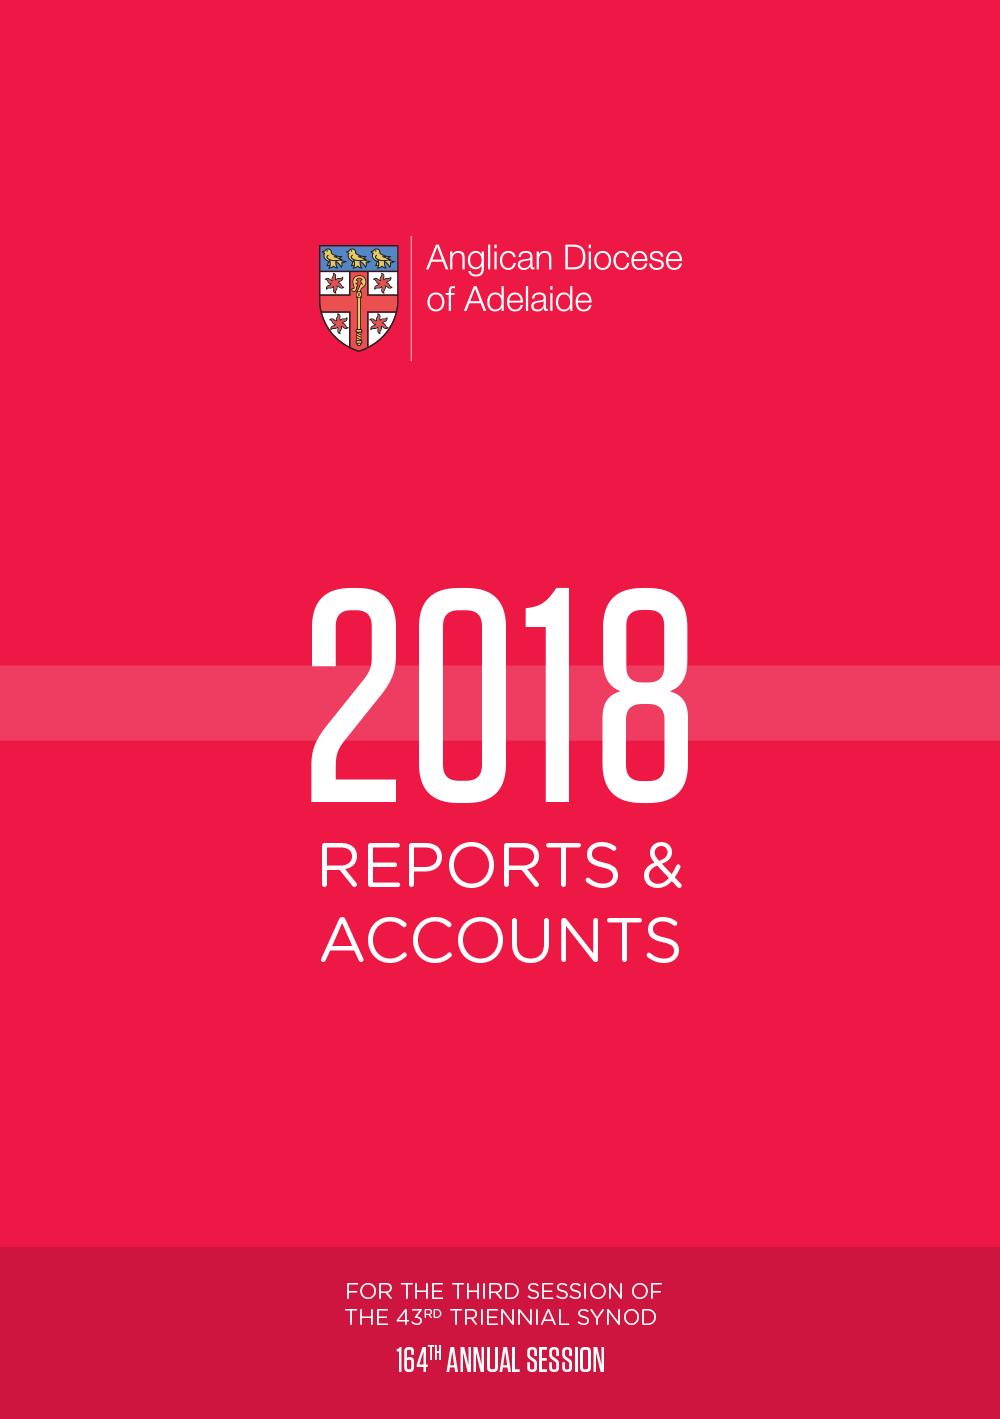 Download  the 2018 Reports & Accounts Book [PDF 4.2MB]